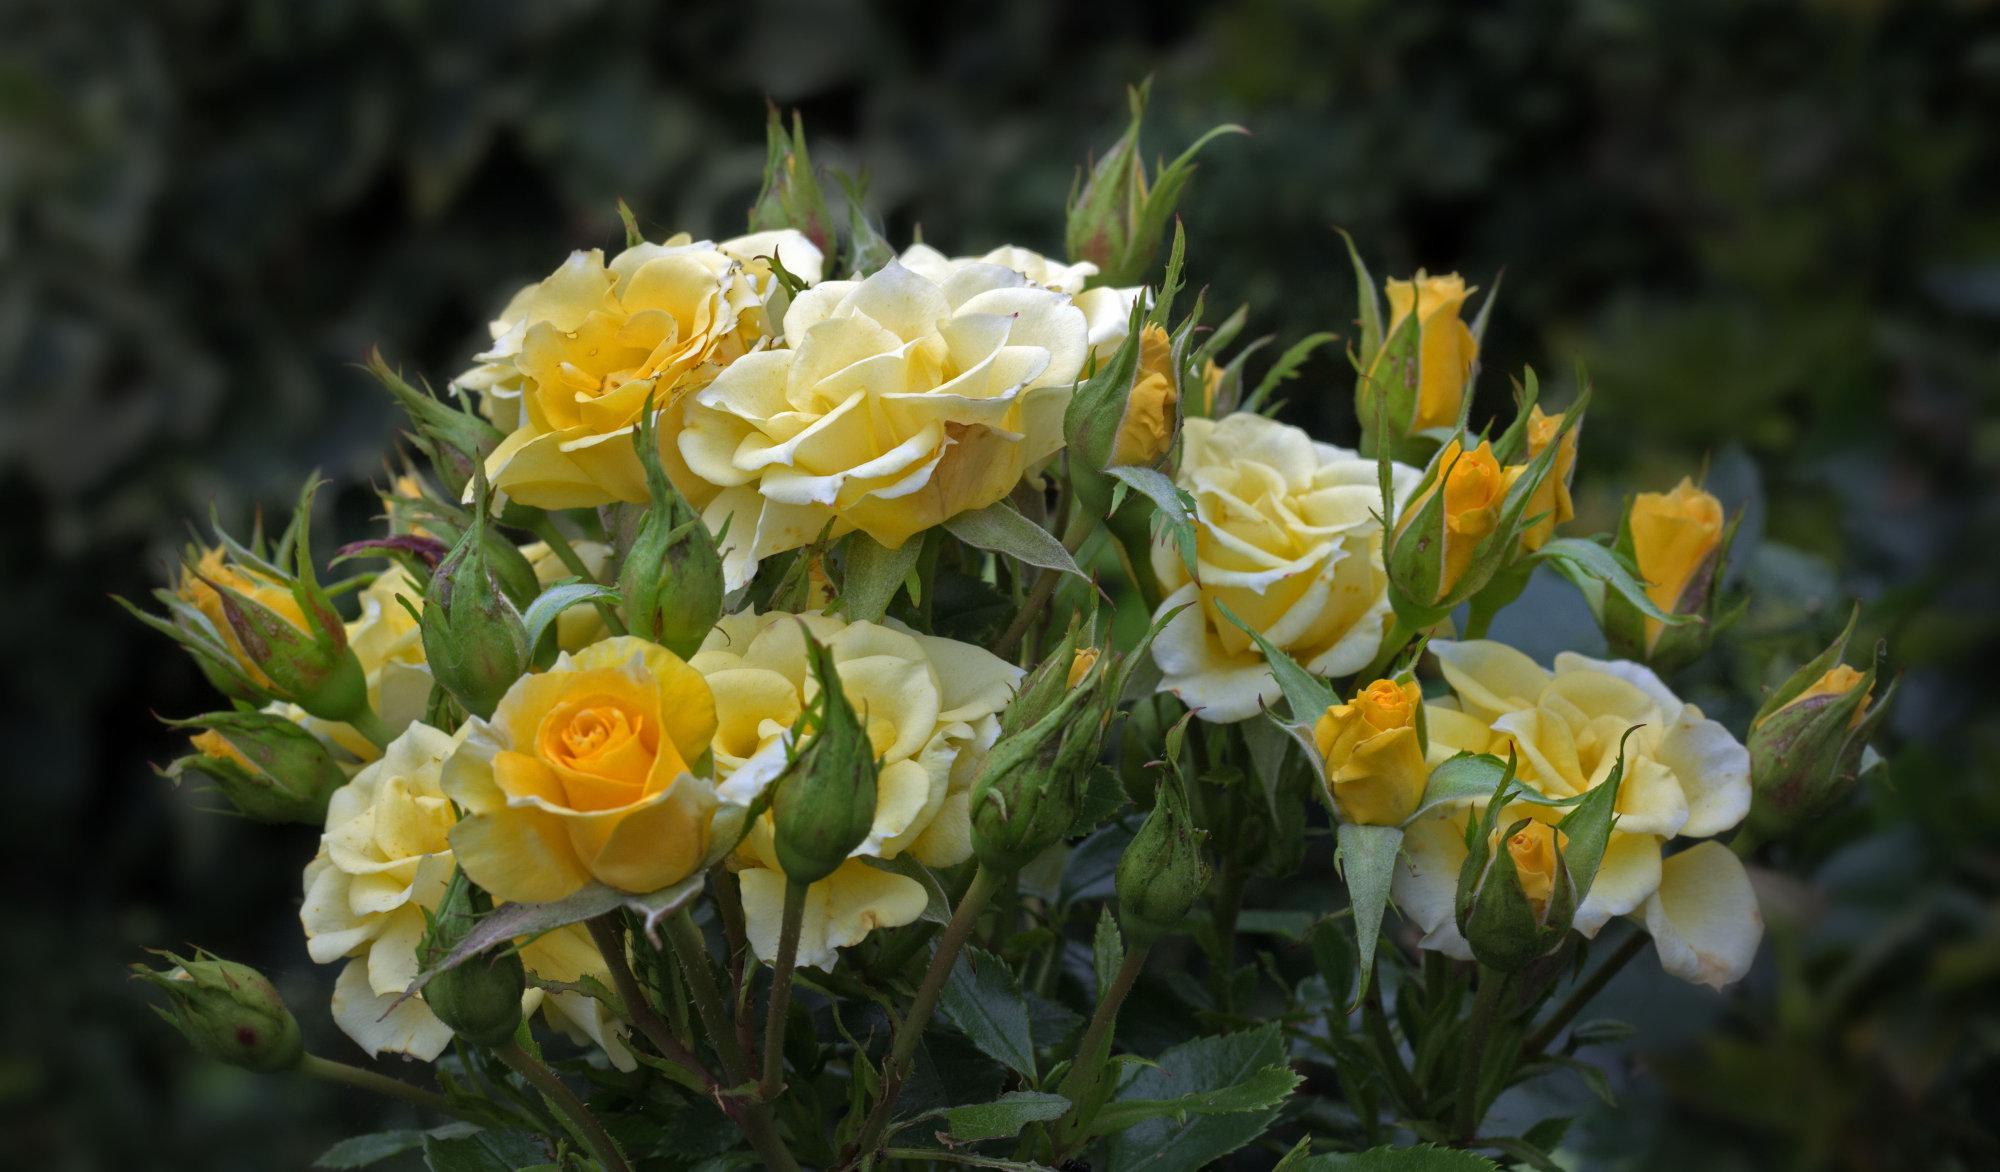 My roses.